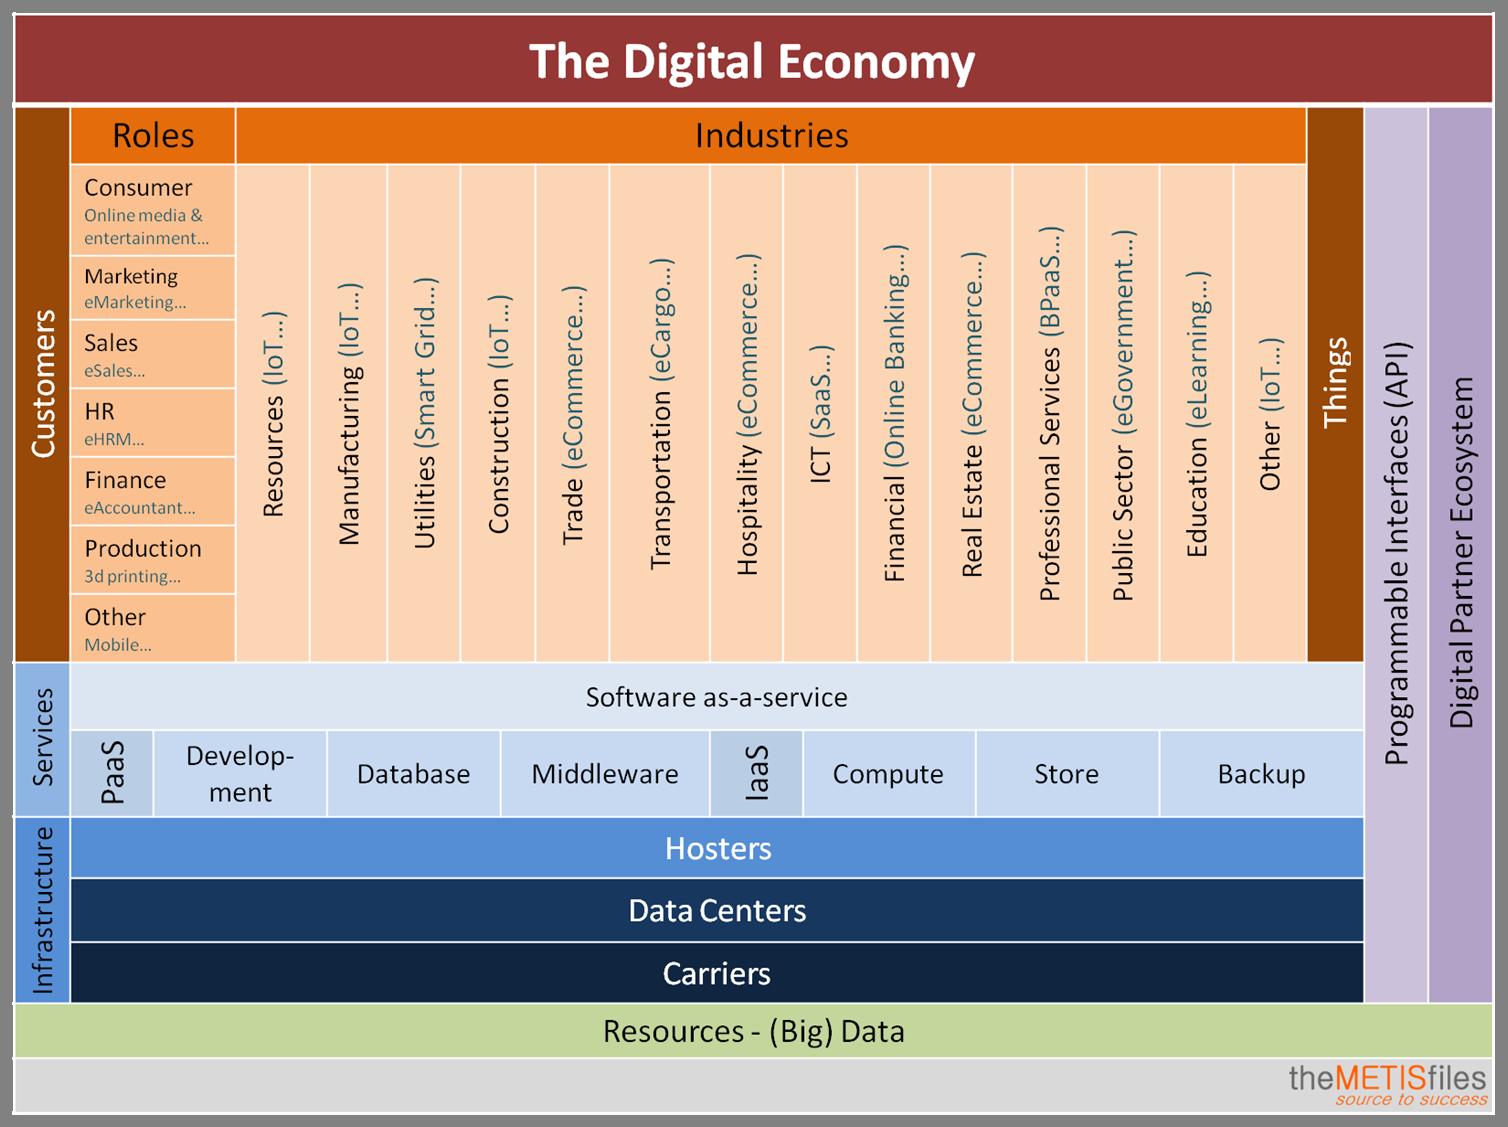 The Digital Economy